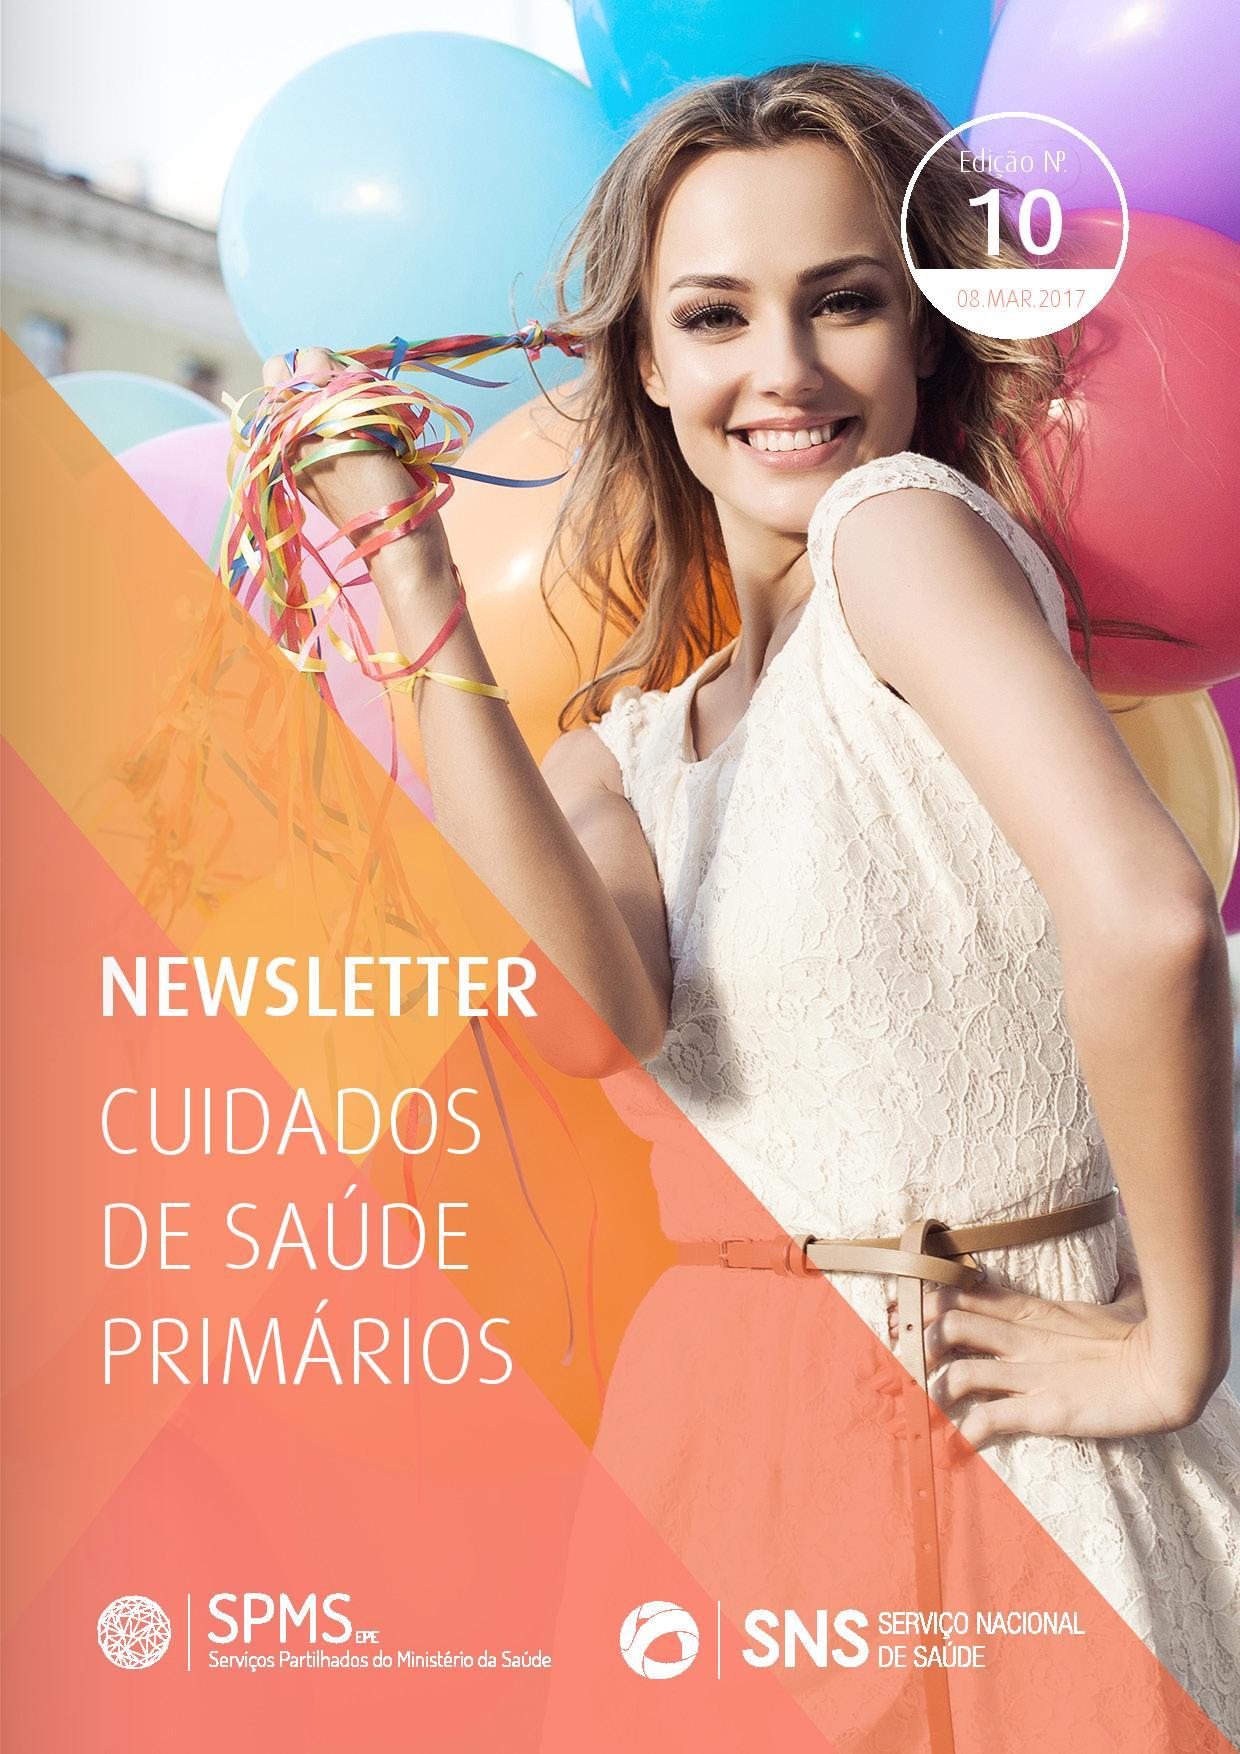 capa_newsletter_csp_n10_20170308